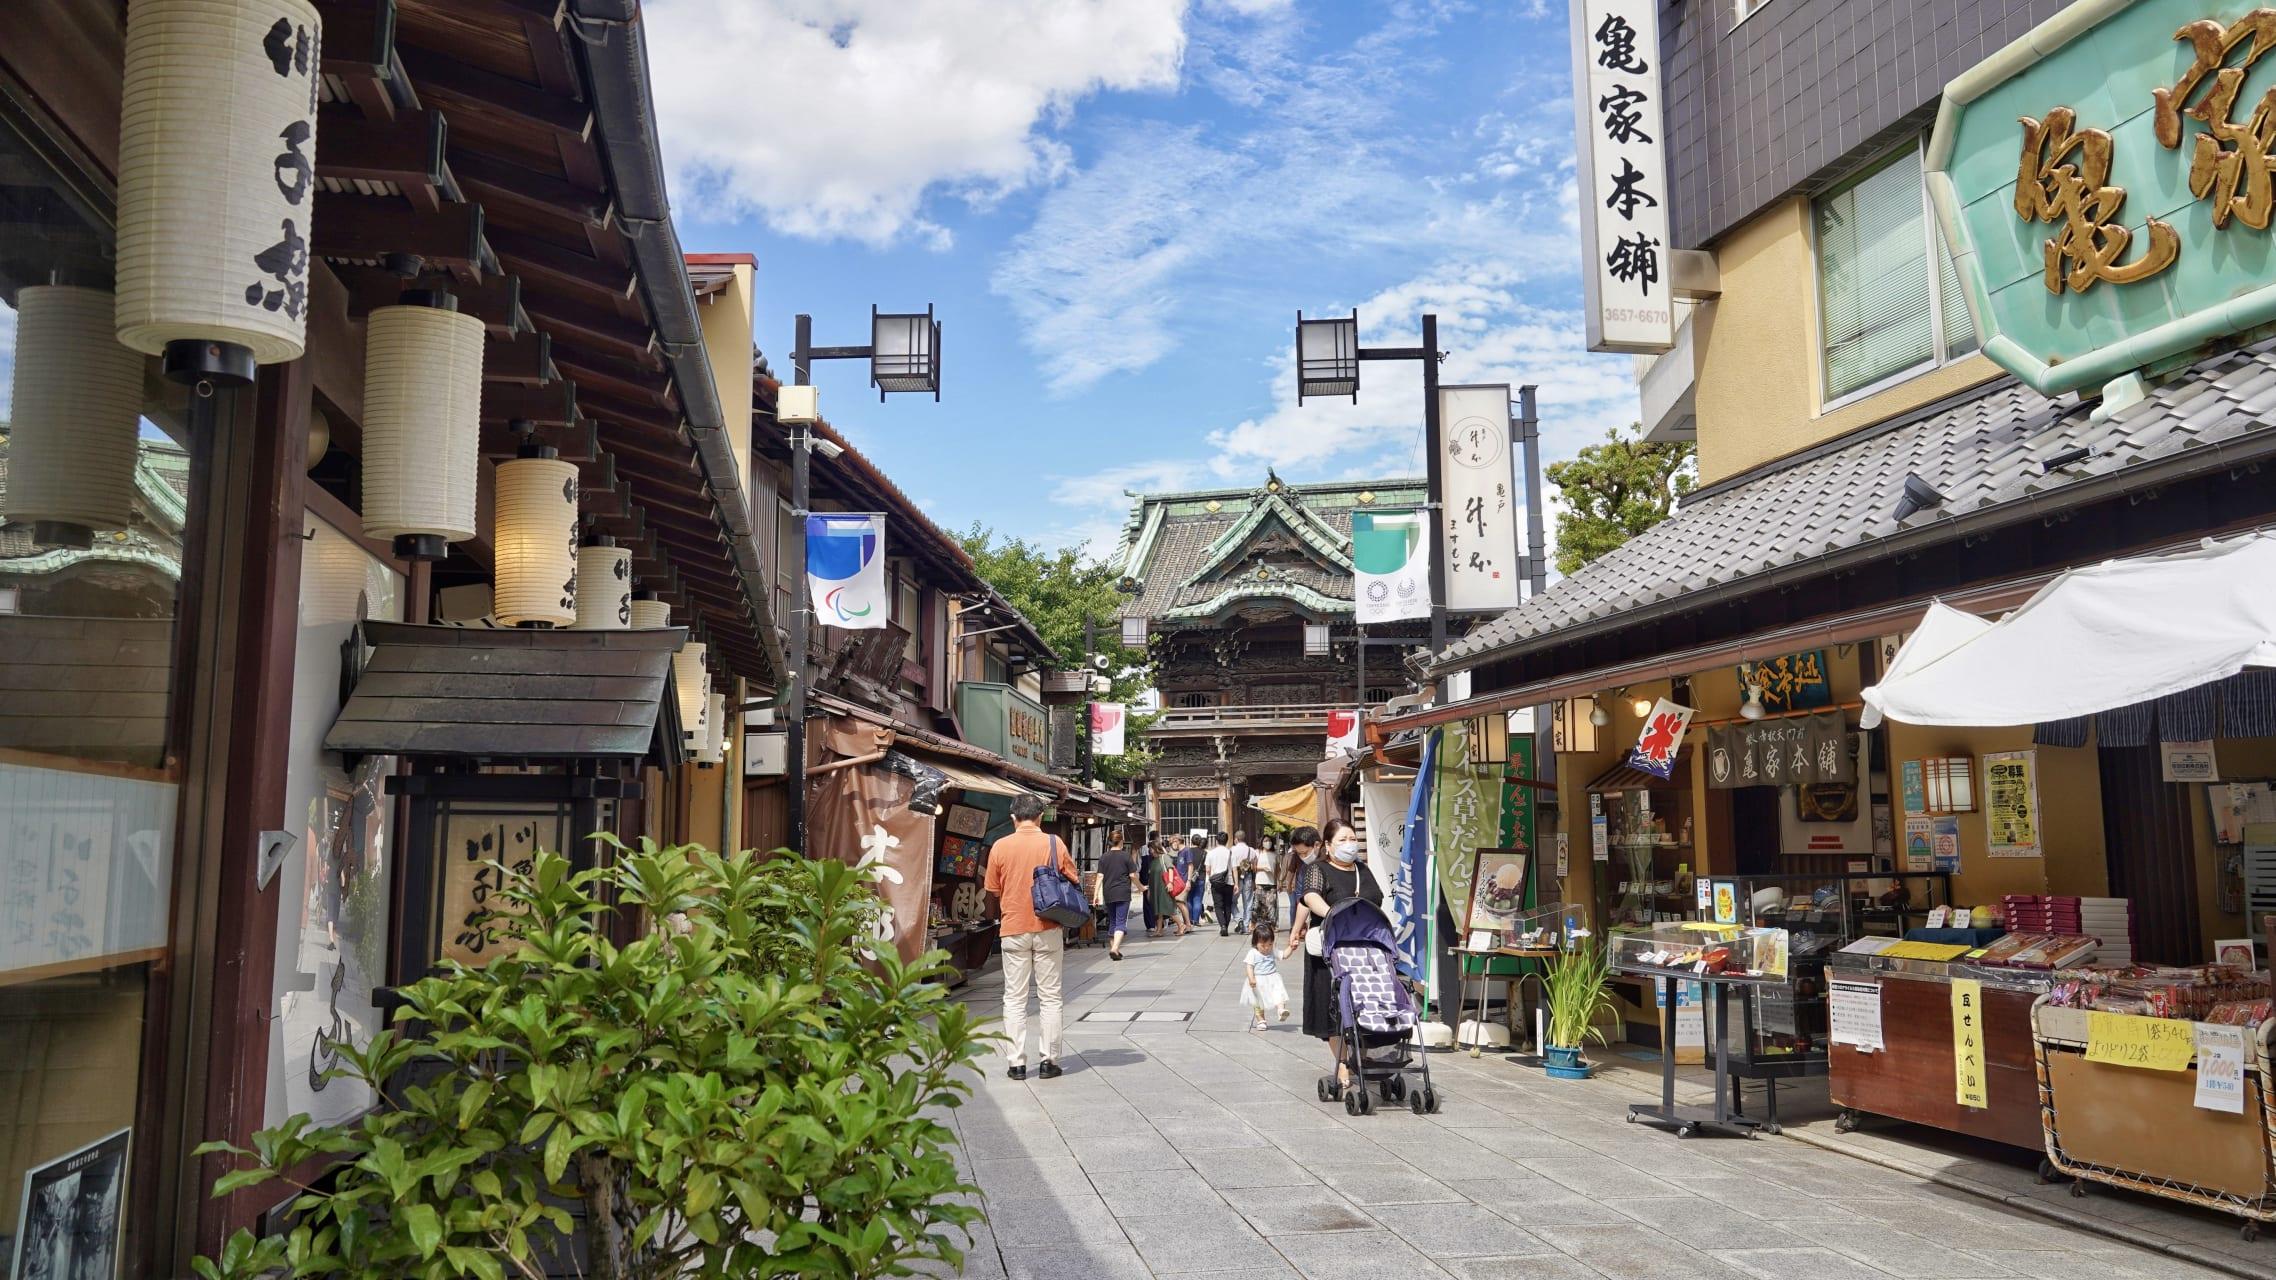 Tokyo - Delightful Nostalgia - Tokyo's Most Charming Old Town